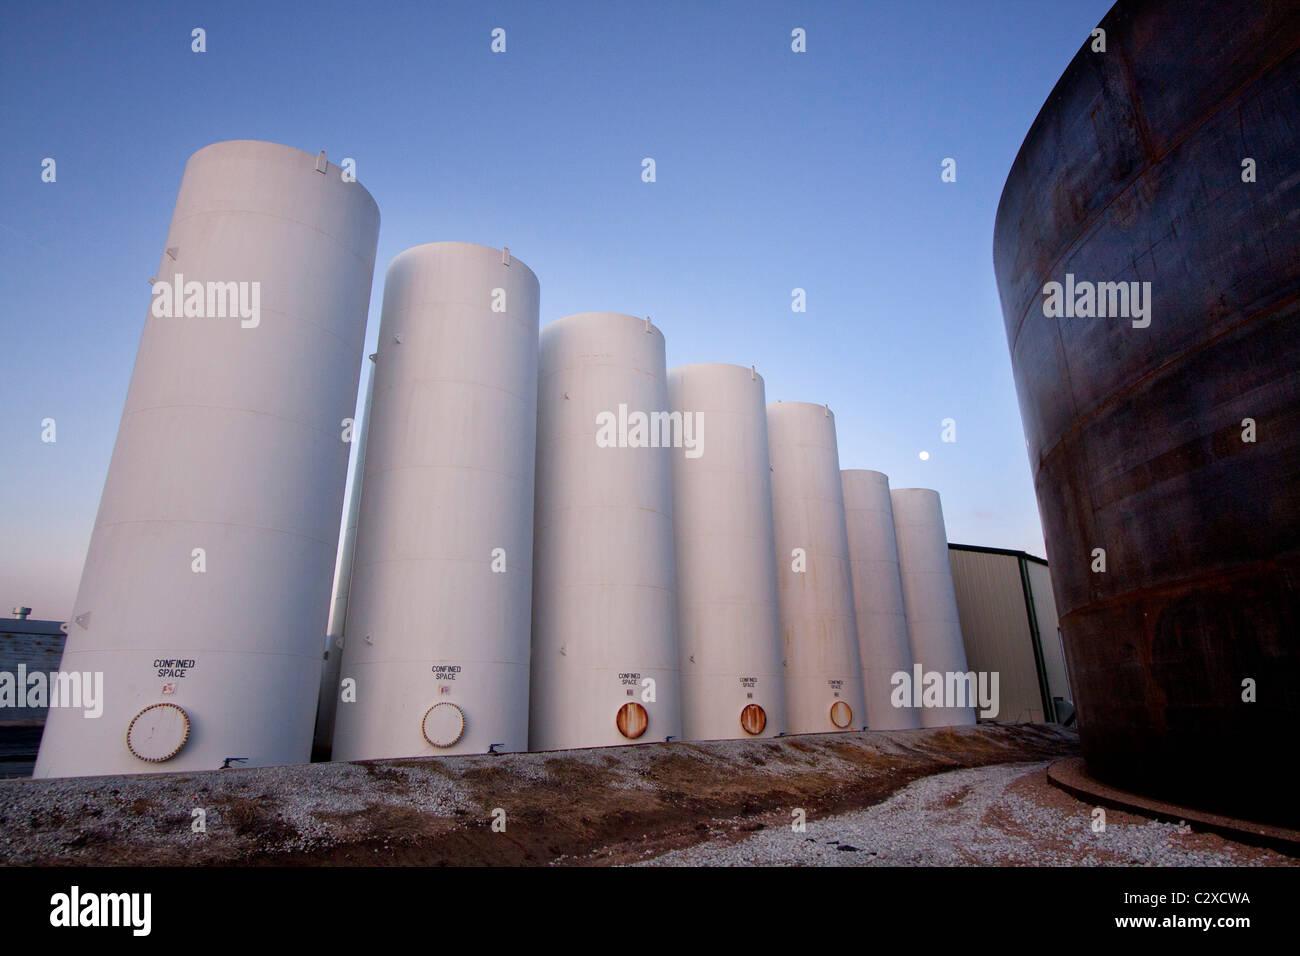 Moon framed by agricultural tanks in rural Nebraska, 2/16/2011 - Stock Image